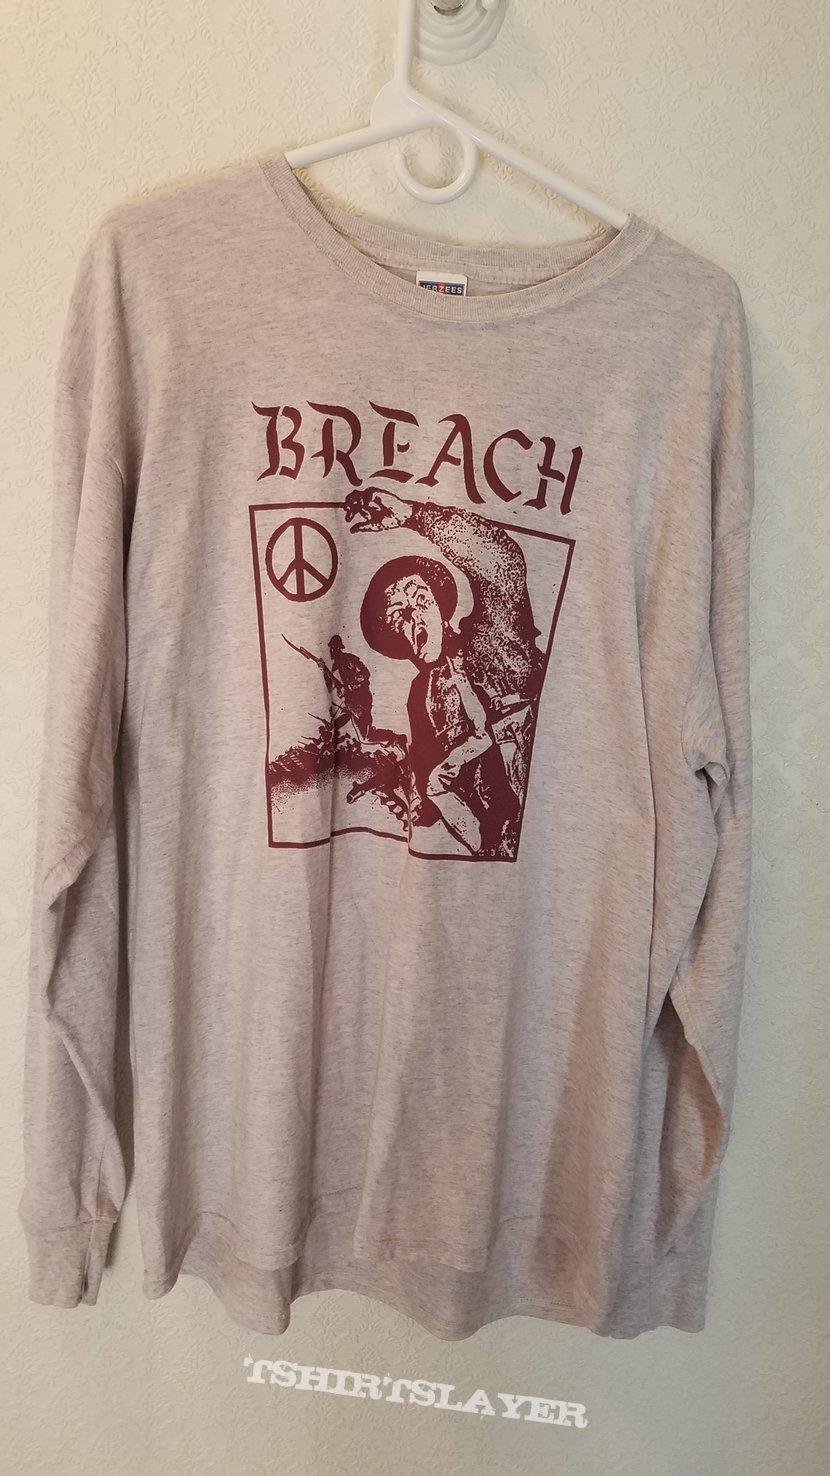 Breach Longsleeve